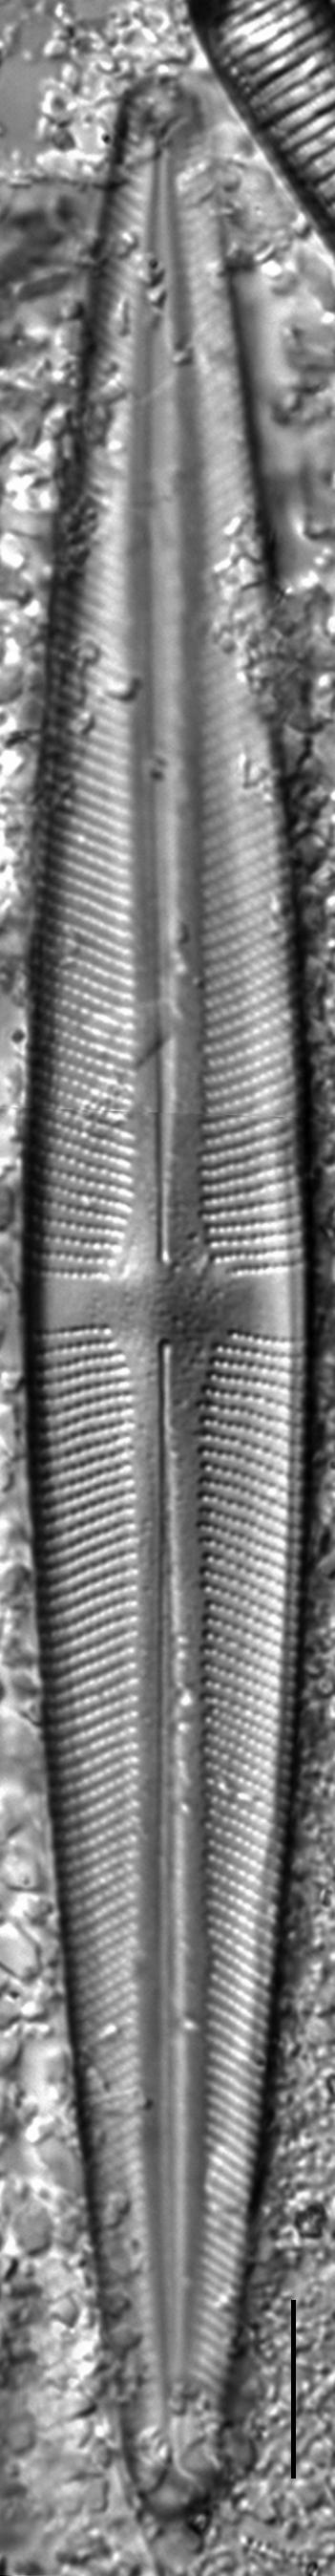 Stauroneis kingstonii LM2